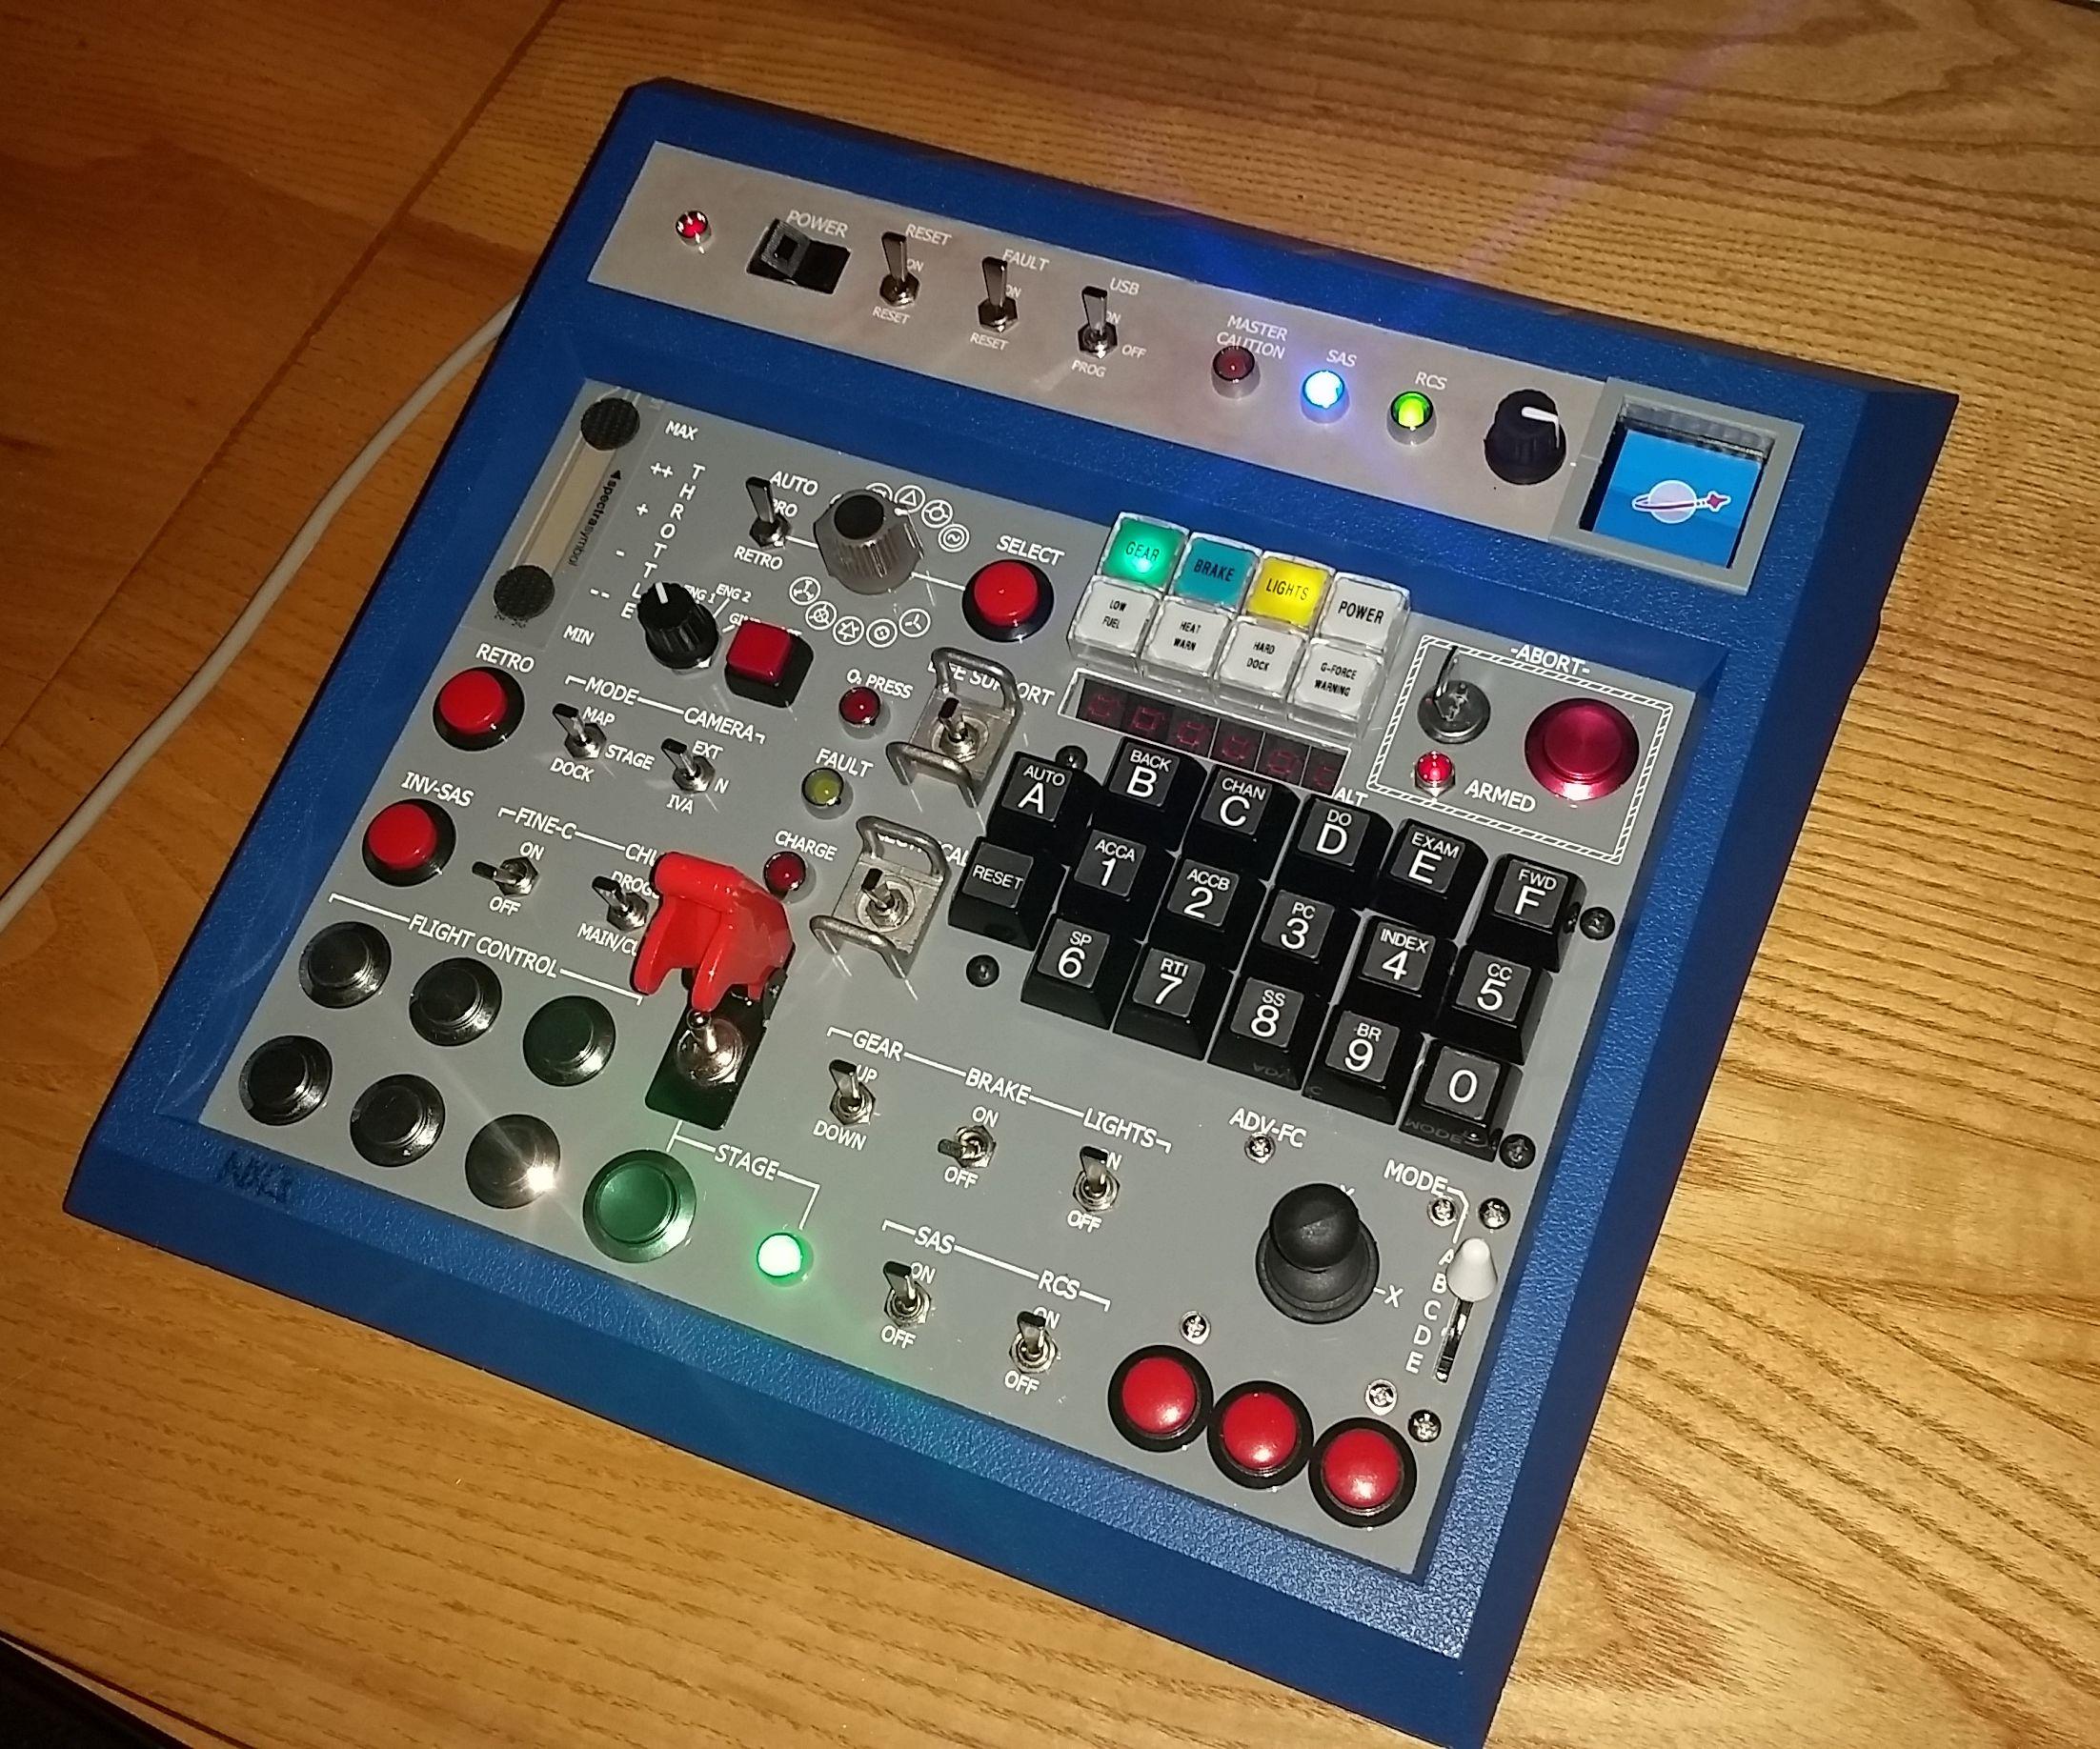 Kerbal Space Program Controller: